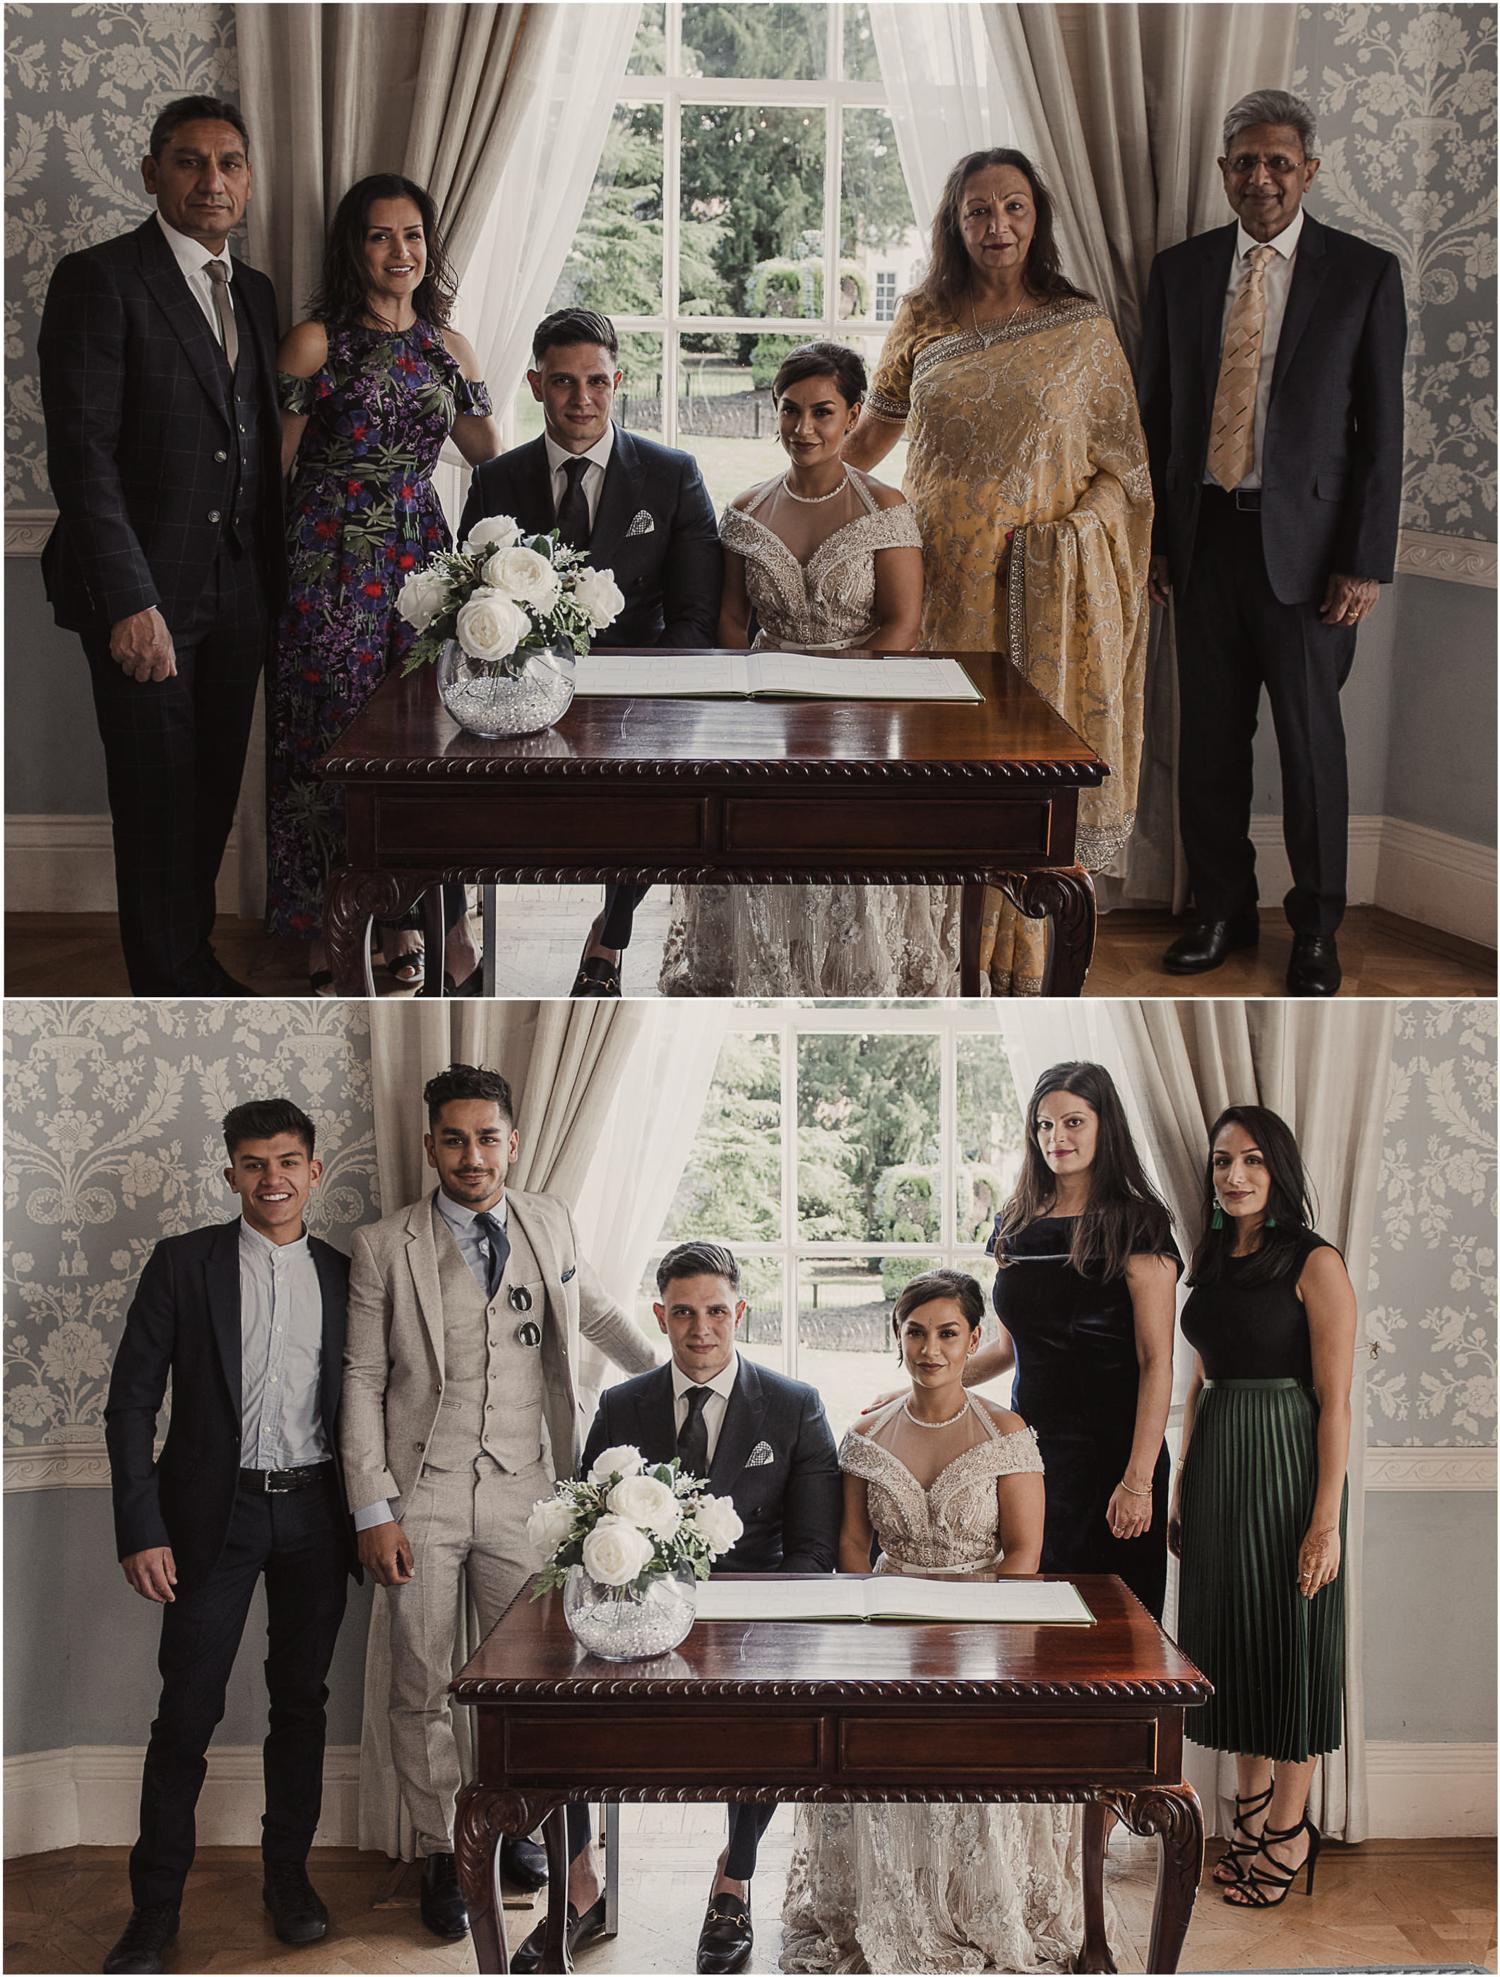 Langtons House family wedding photos